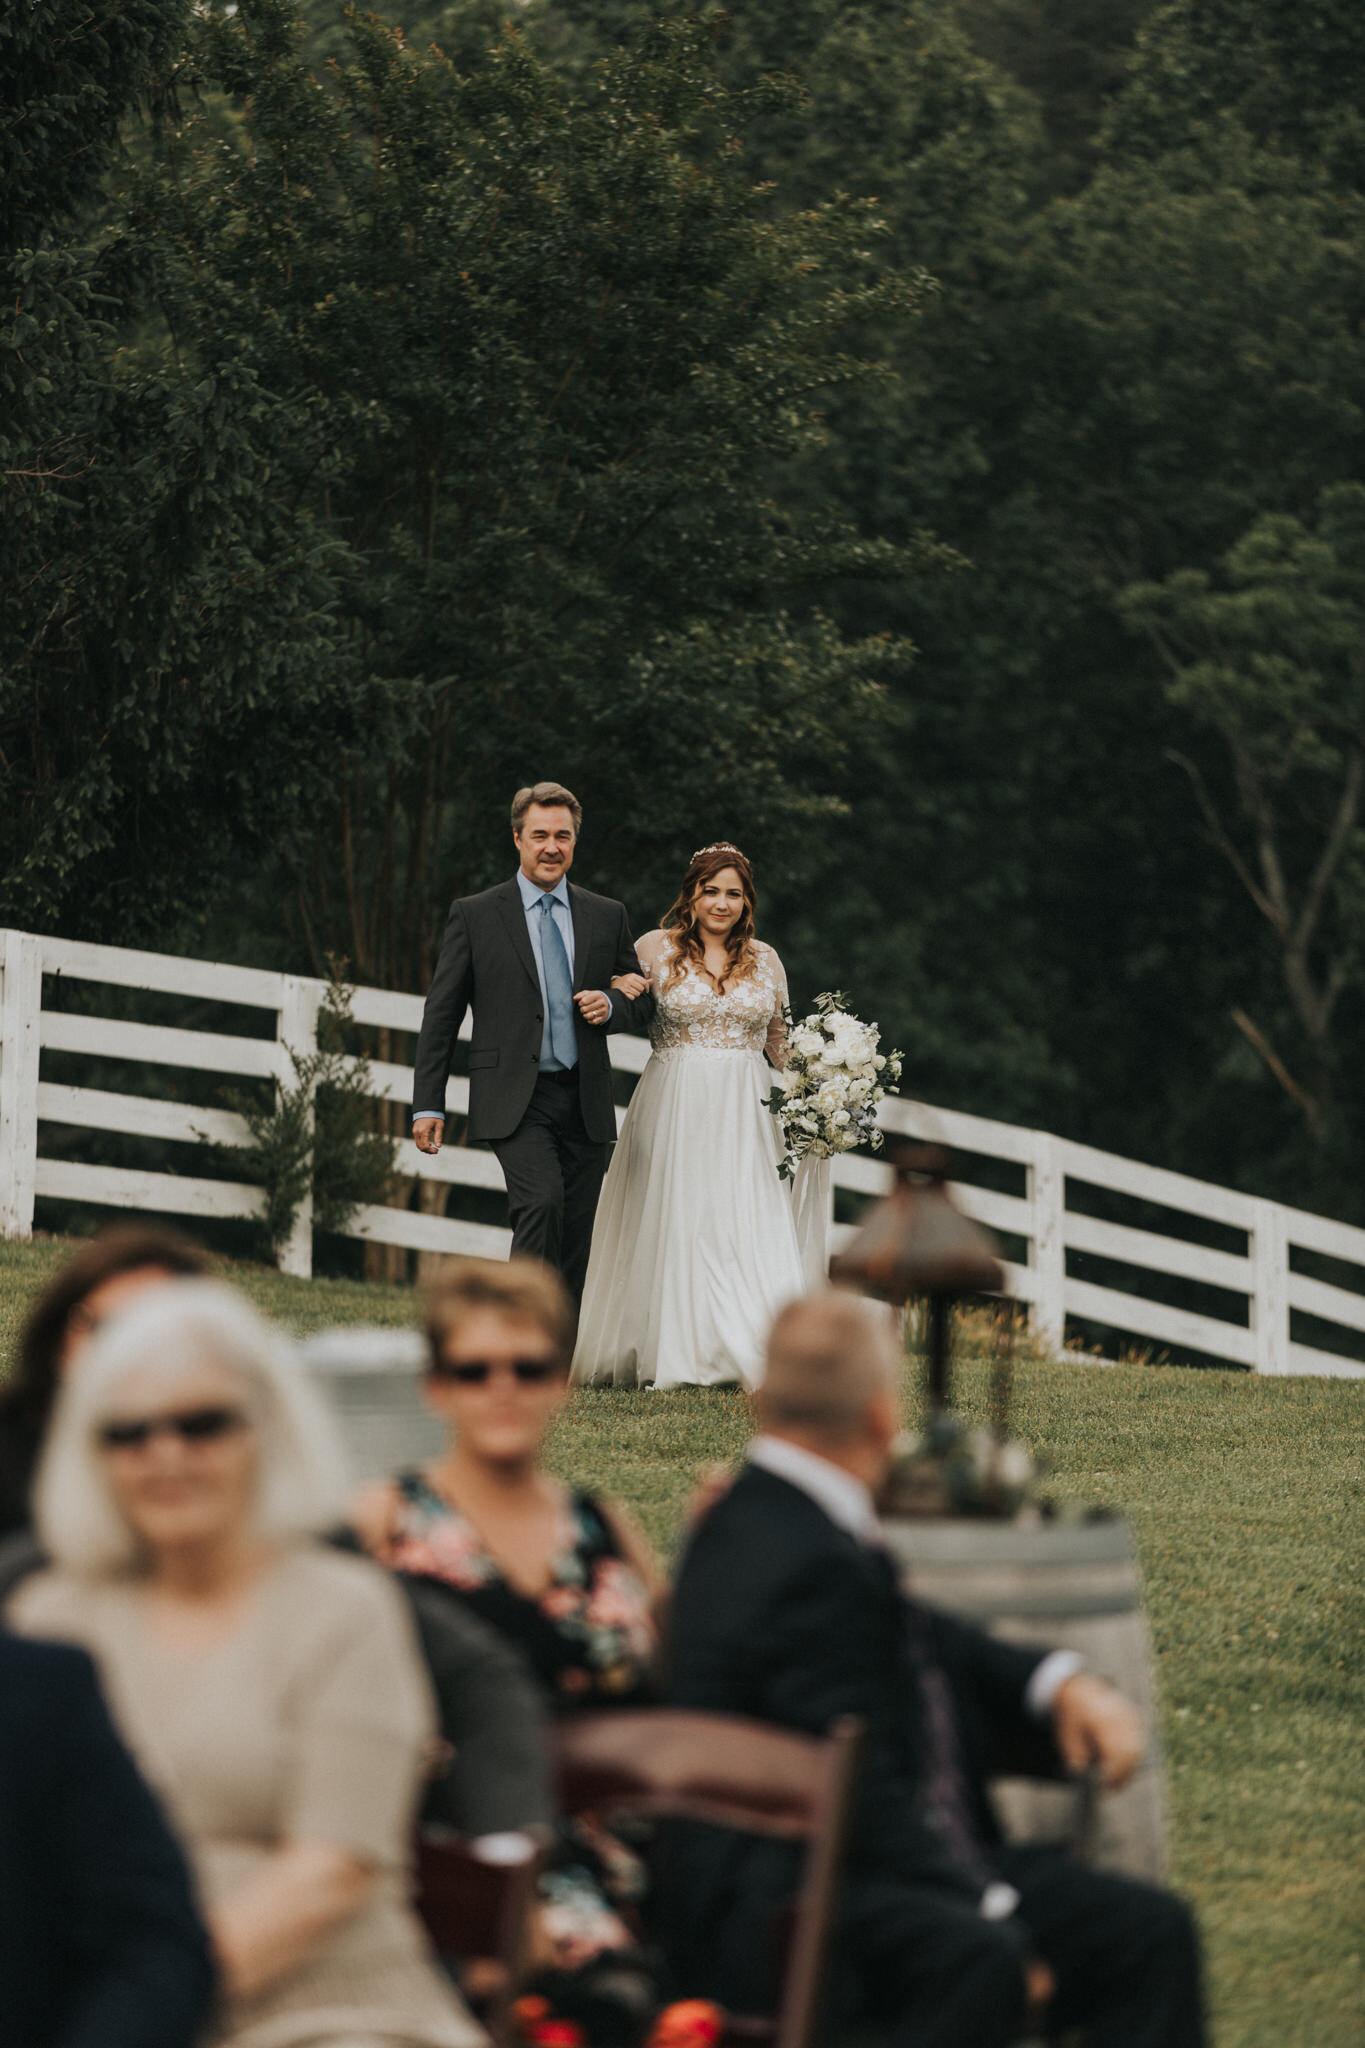 KateMatt-North-Georgia-Wedding-Photographer-Mountain-Laurel-Farm-96.jpg